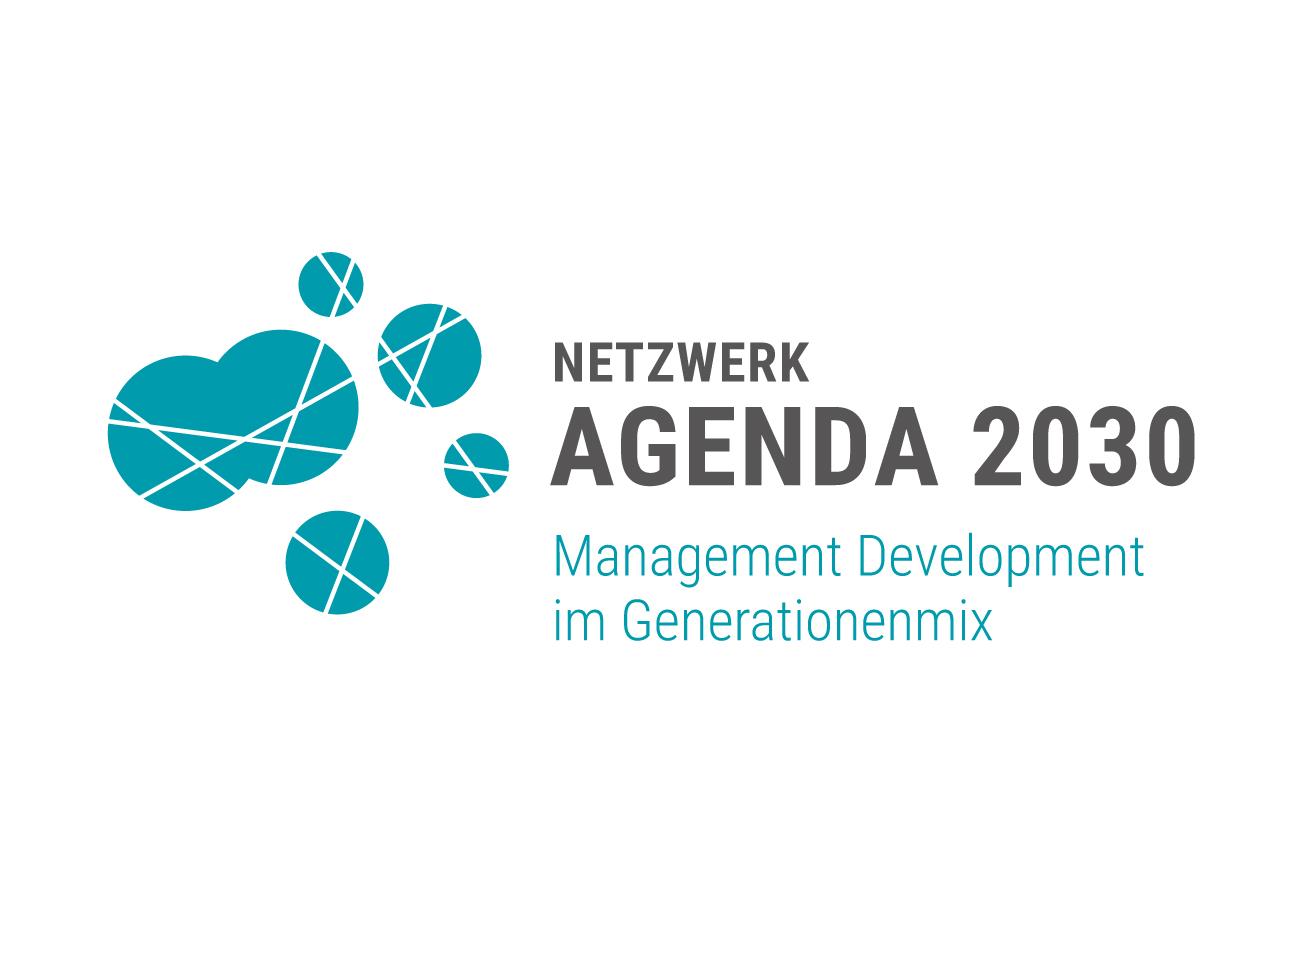 martin zech design, corporate design, agenda 2030, logo